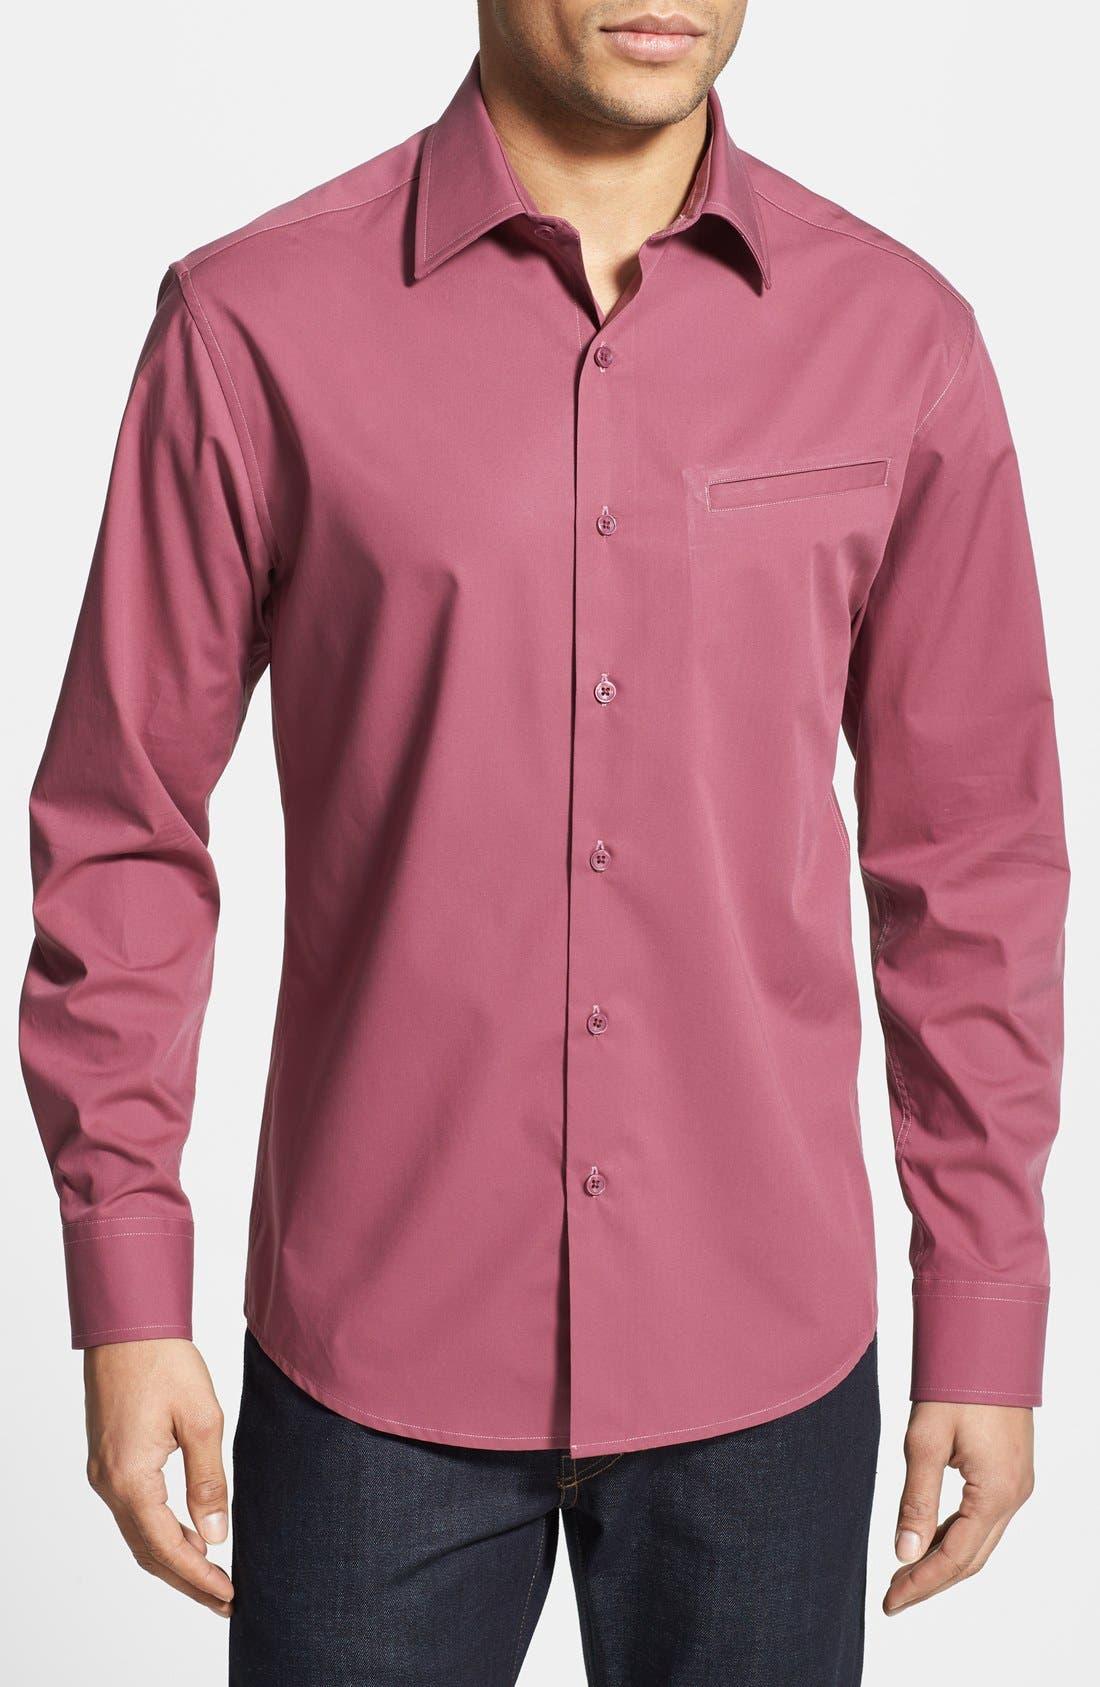 Alternate Image 1 Selected - Vince Camuto Slim Fit Sport Shirt